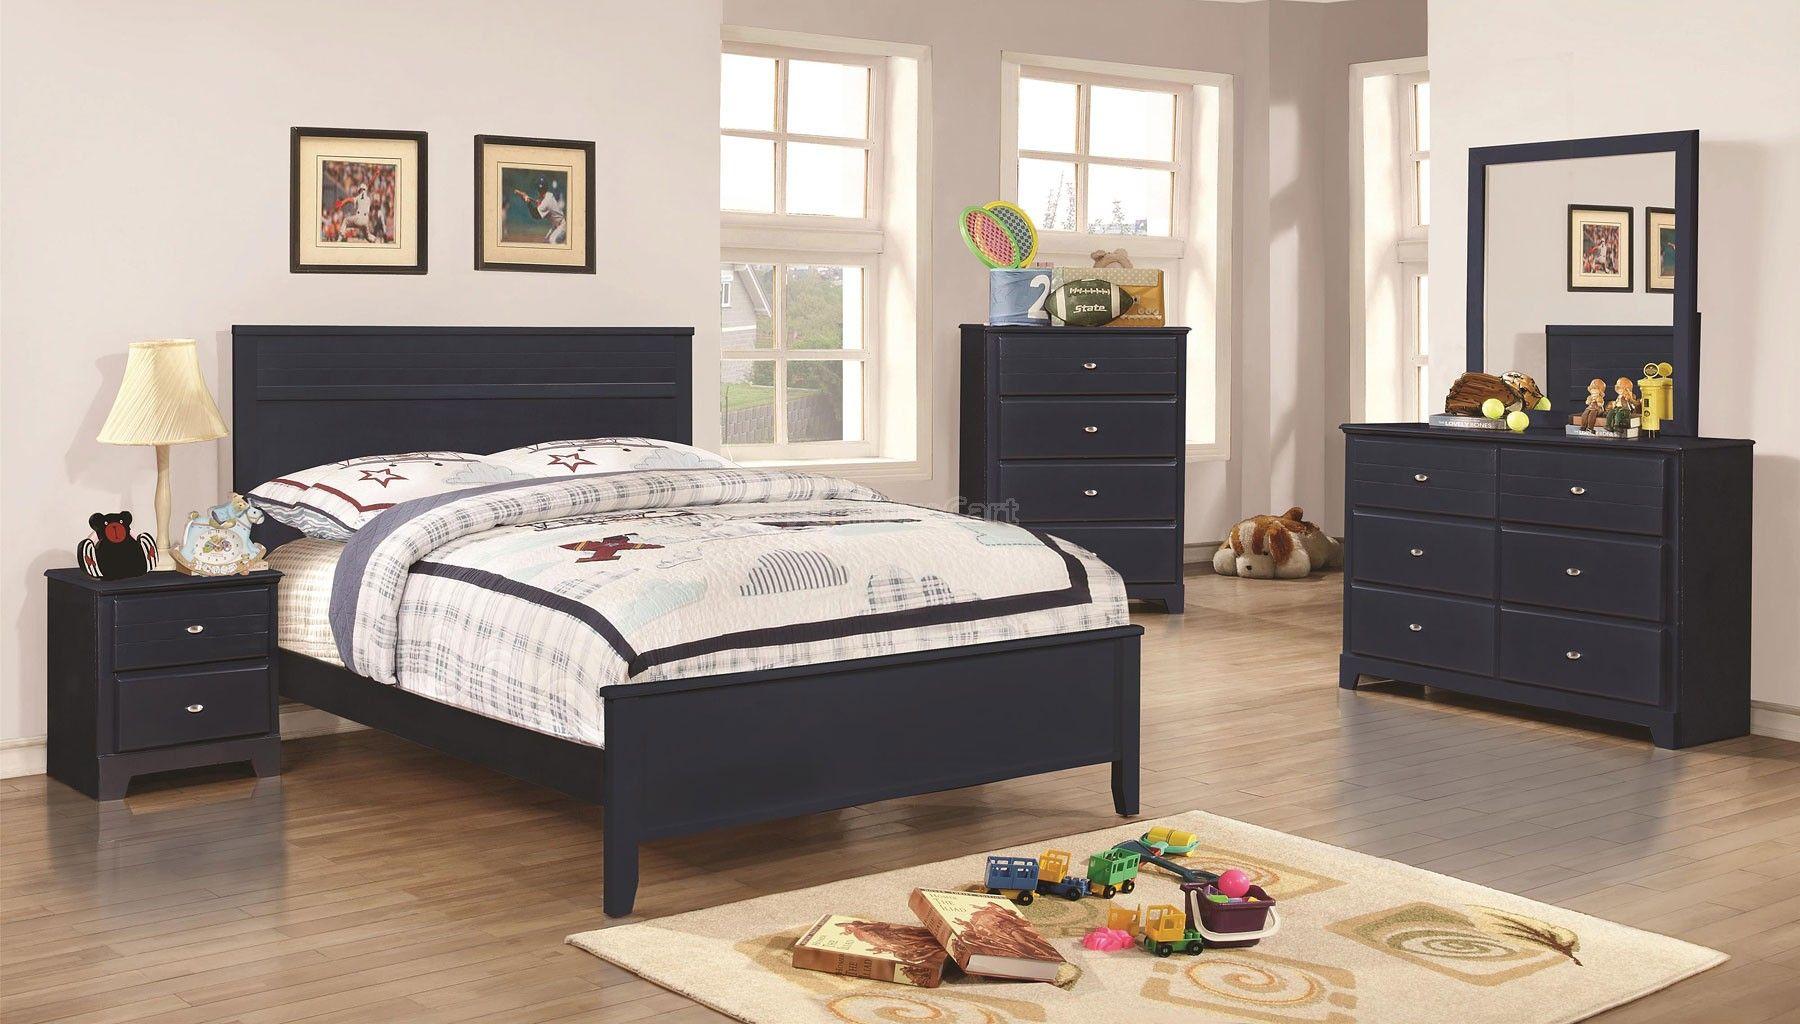 Ashton Youth Bedroom Set Navy Blue Bedroom Furniture